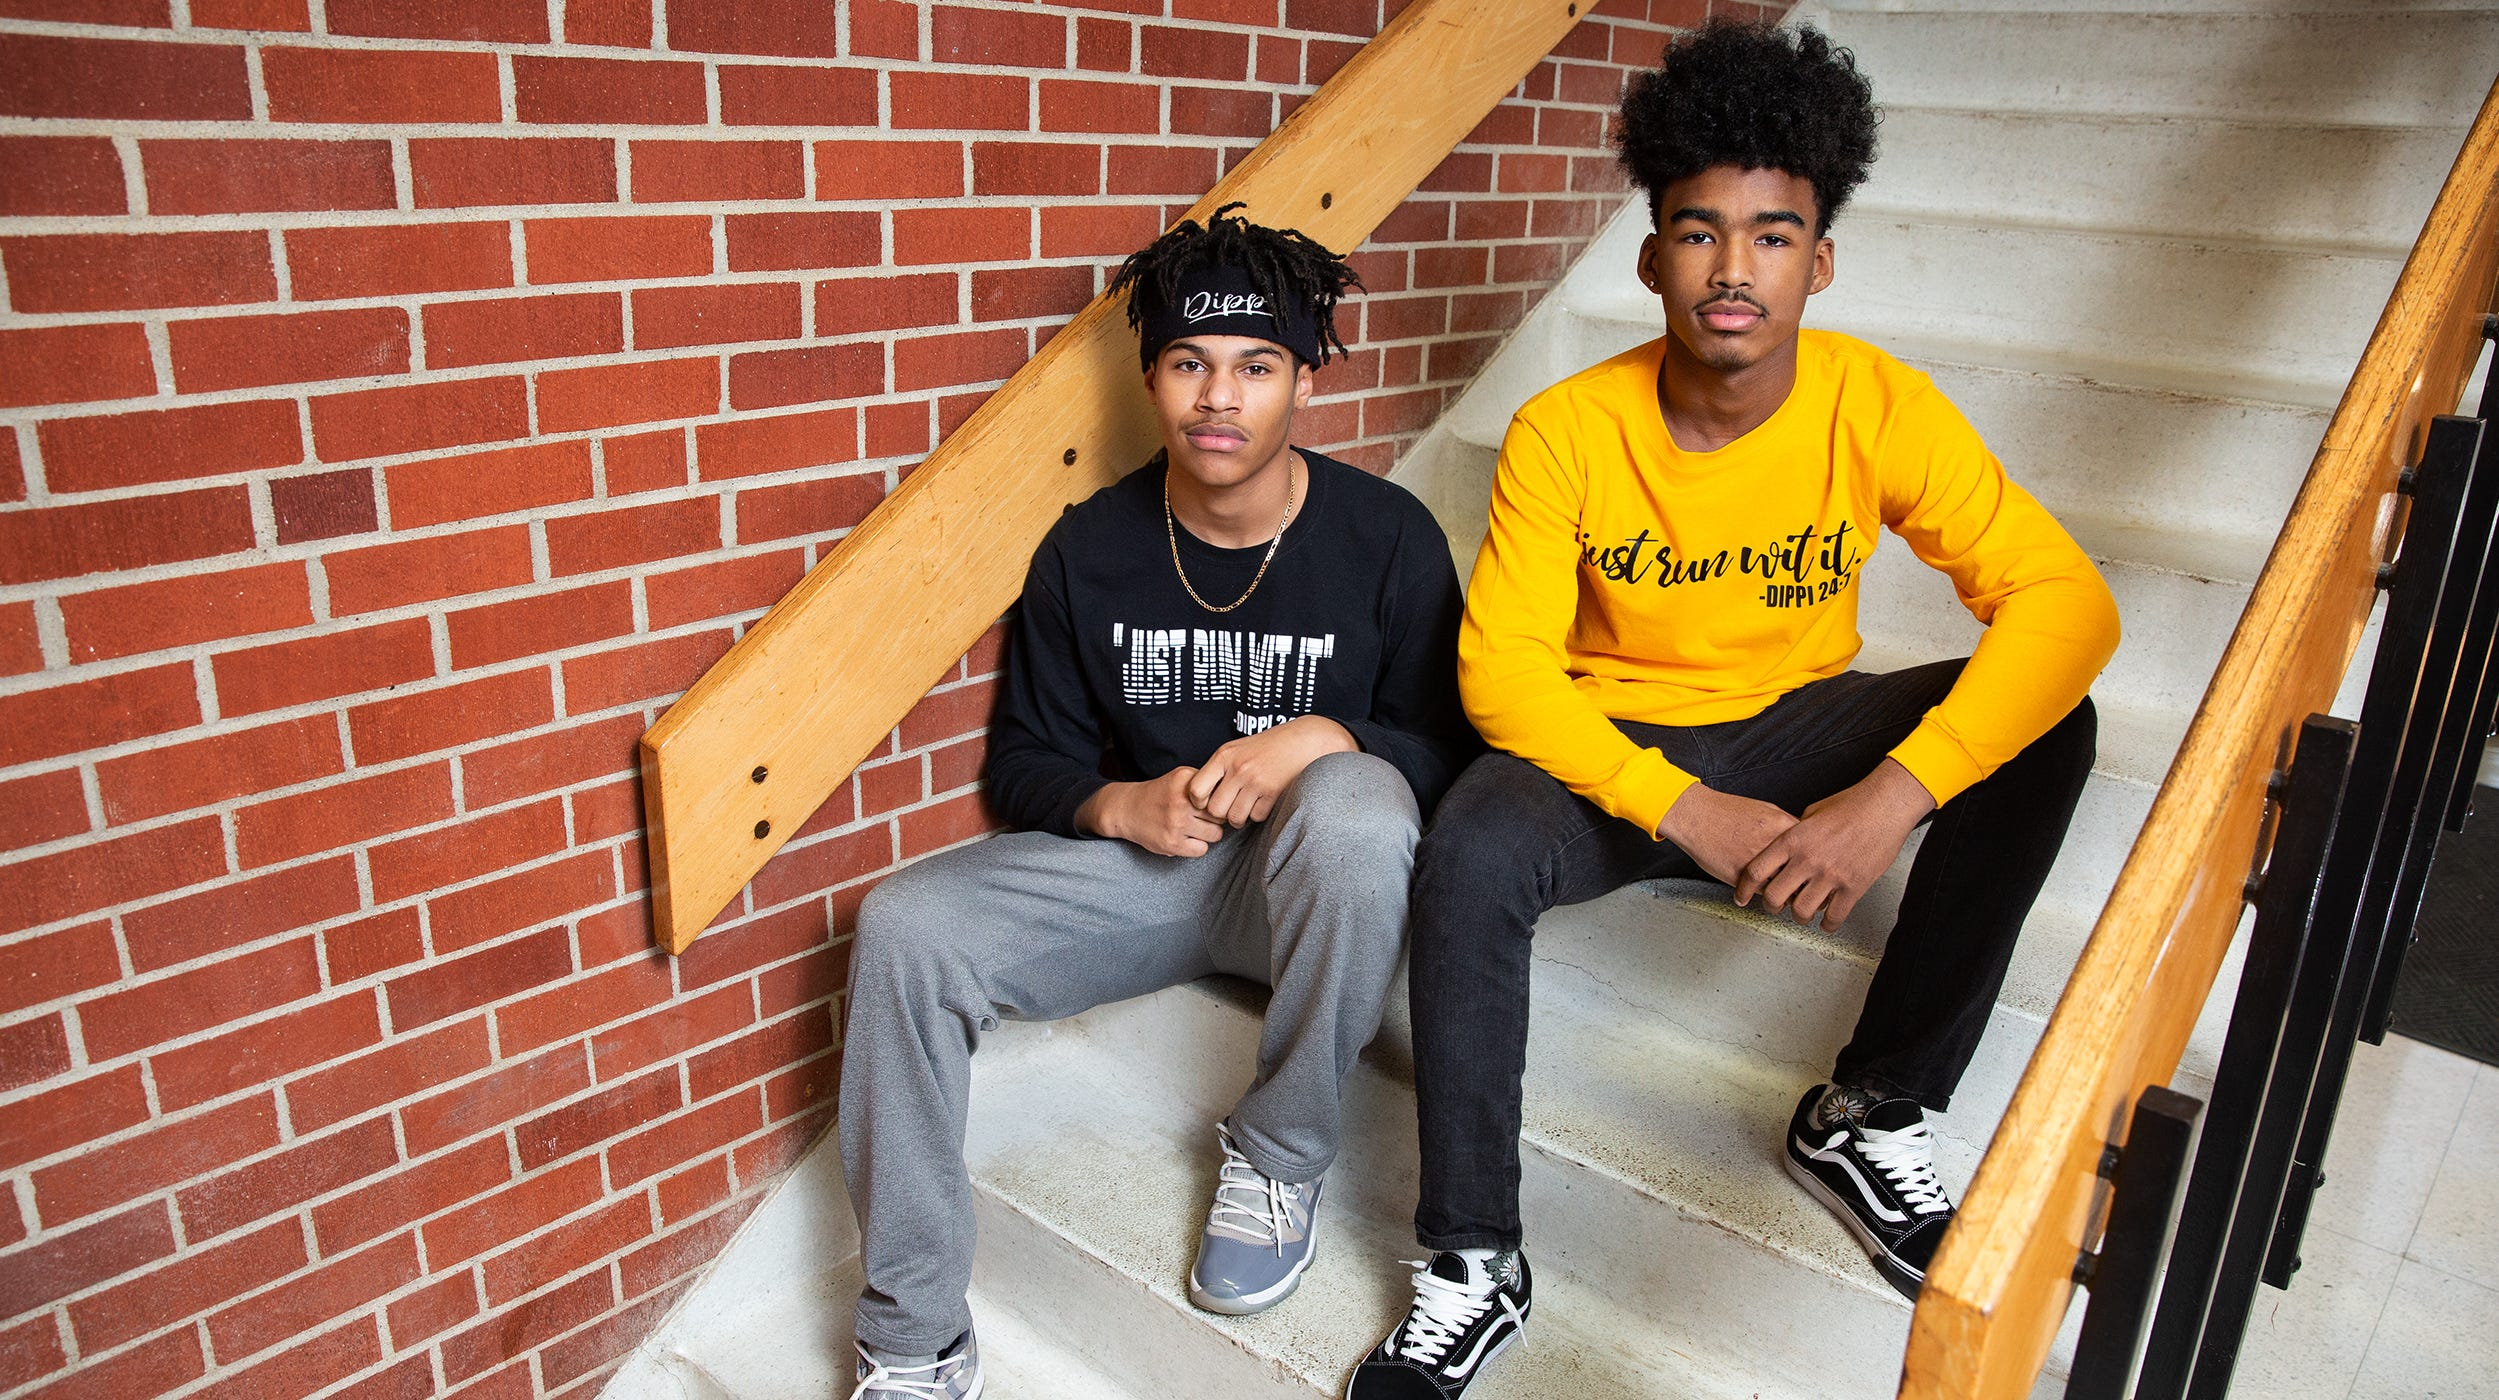 Roosevelt student entrepreneurs hope to dress for success